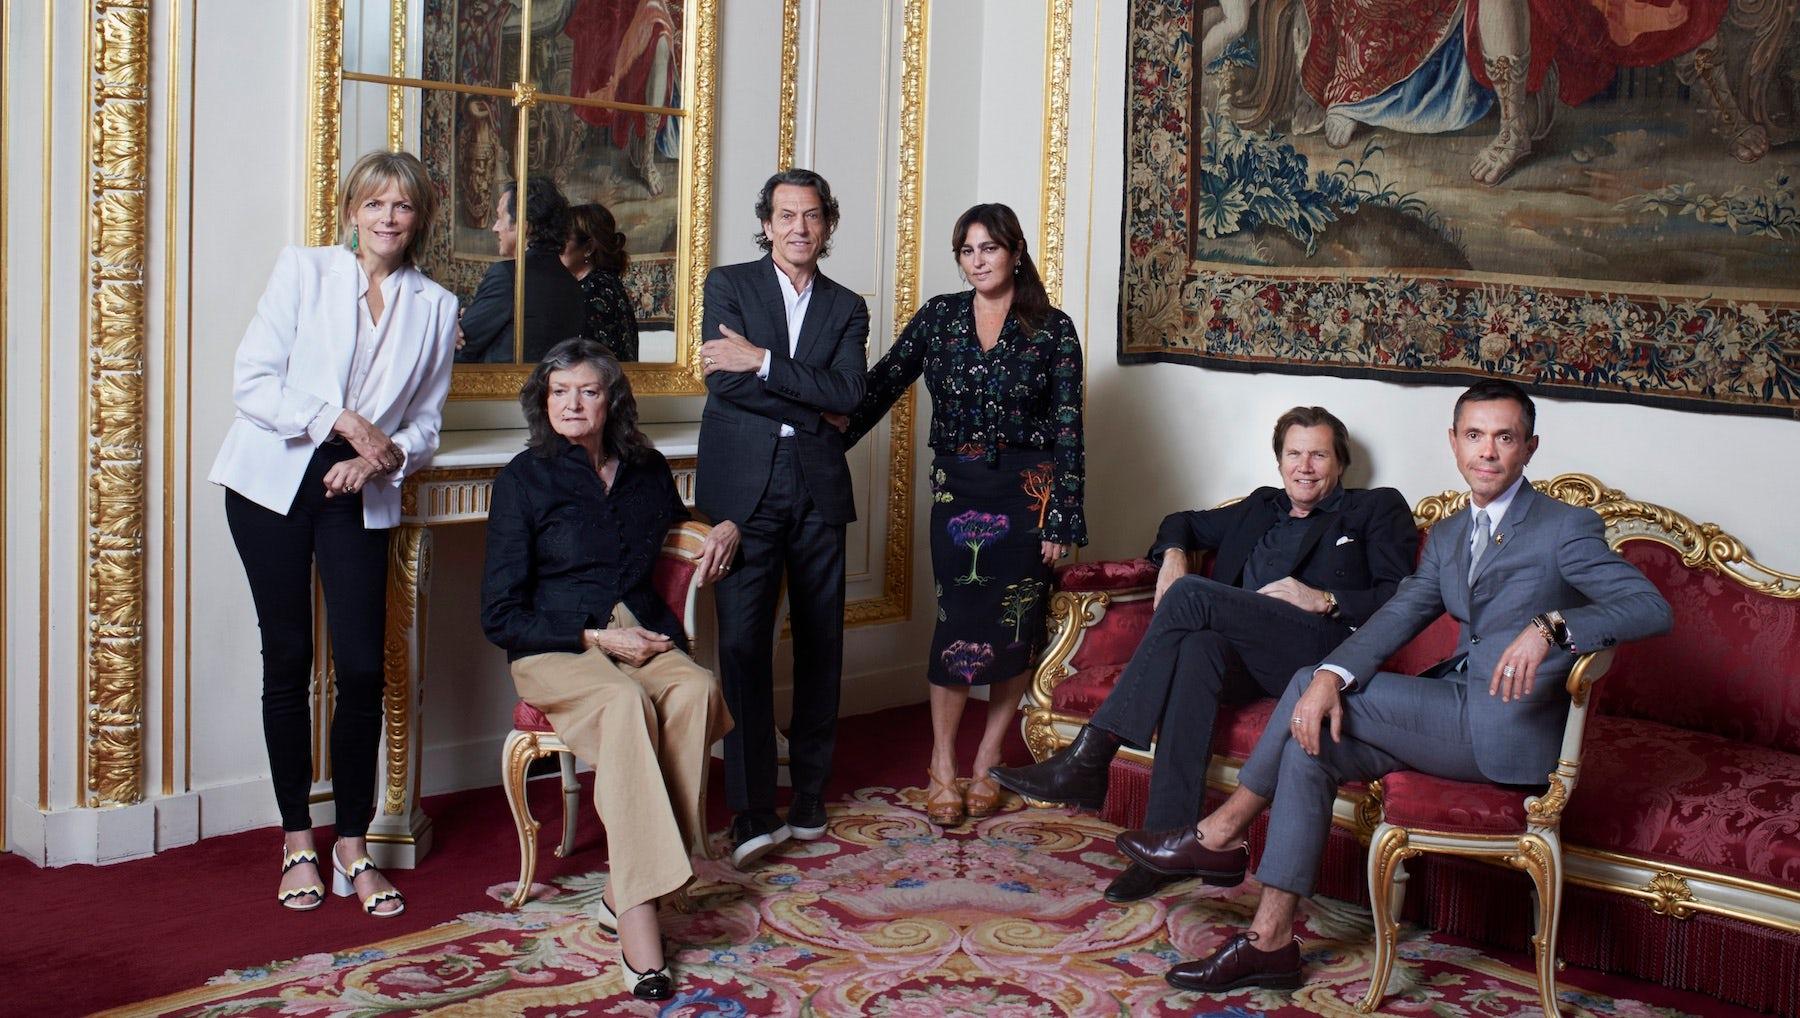 The Leopards, from left: Carol Woolton, Susan Farmer, Stephen Webster, Solange Azagury-Partridge, Theo Fennell, Shaun Leane | Photo: Amelia Troubridge